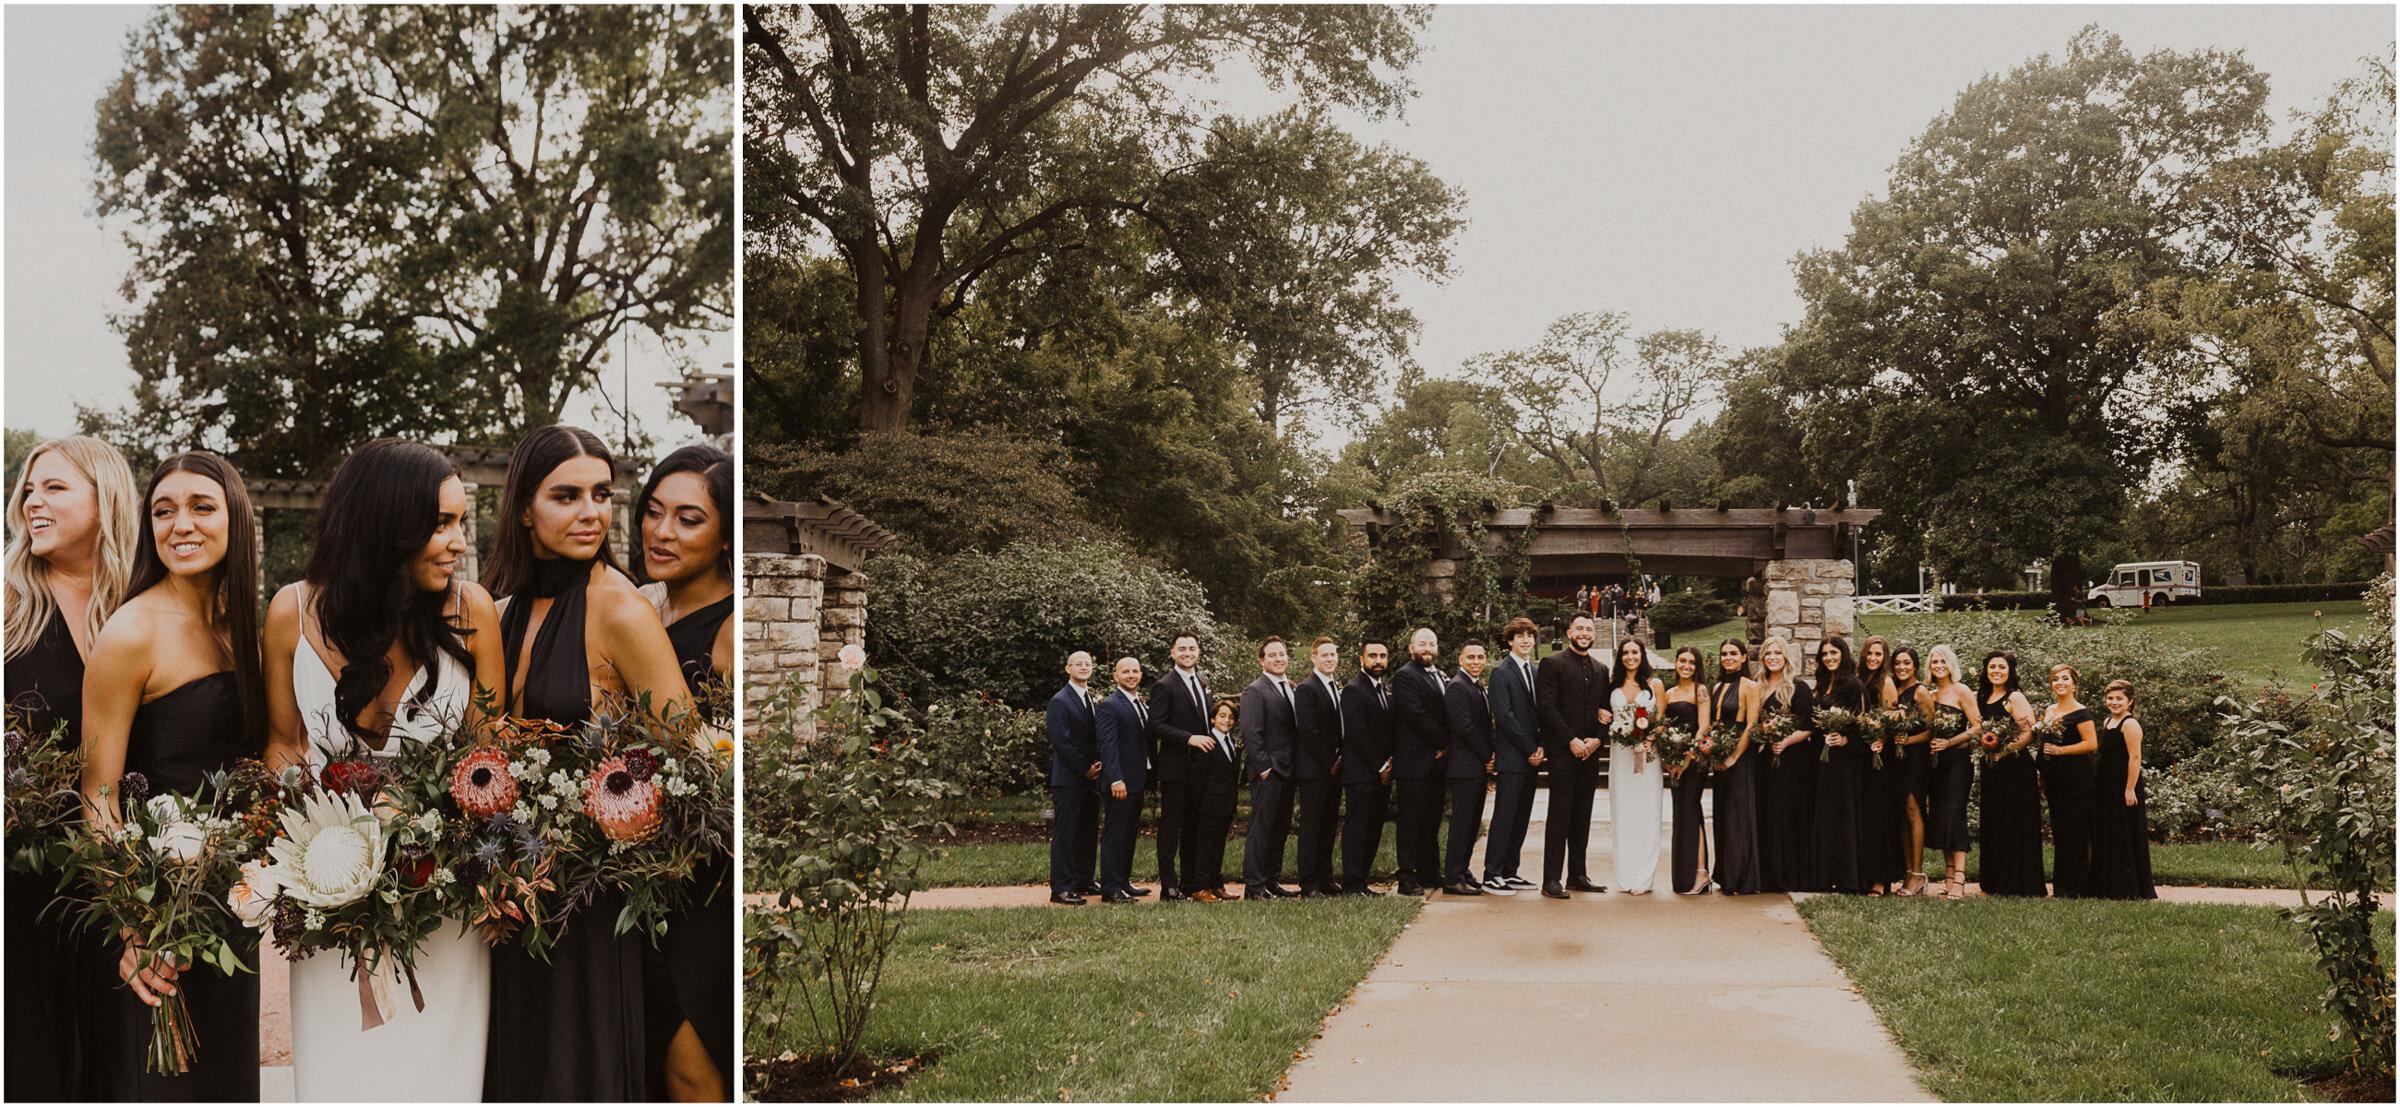 alyssa barletter photography la villa kansas city patio wedding sarah seven wedding dress-22.jpg